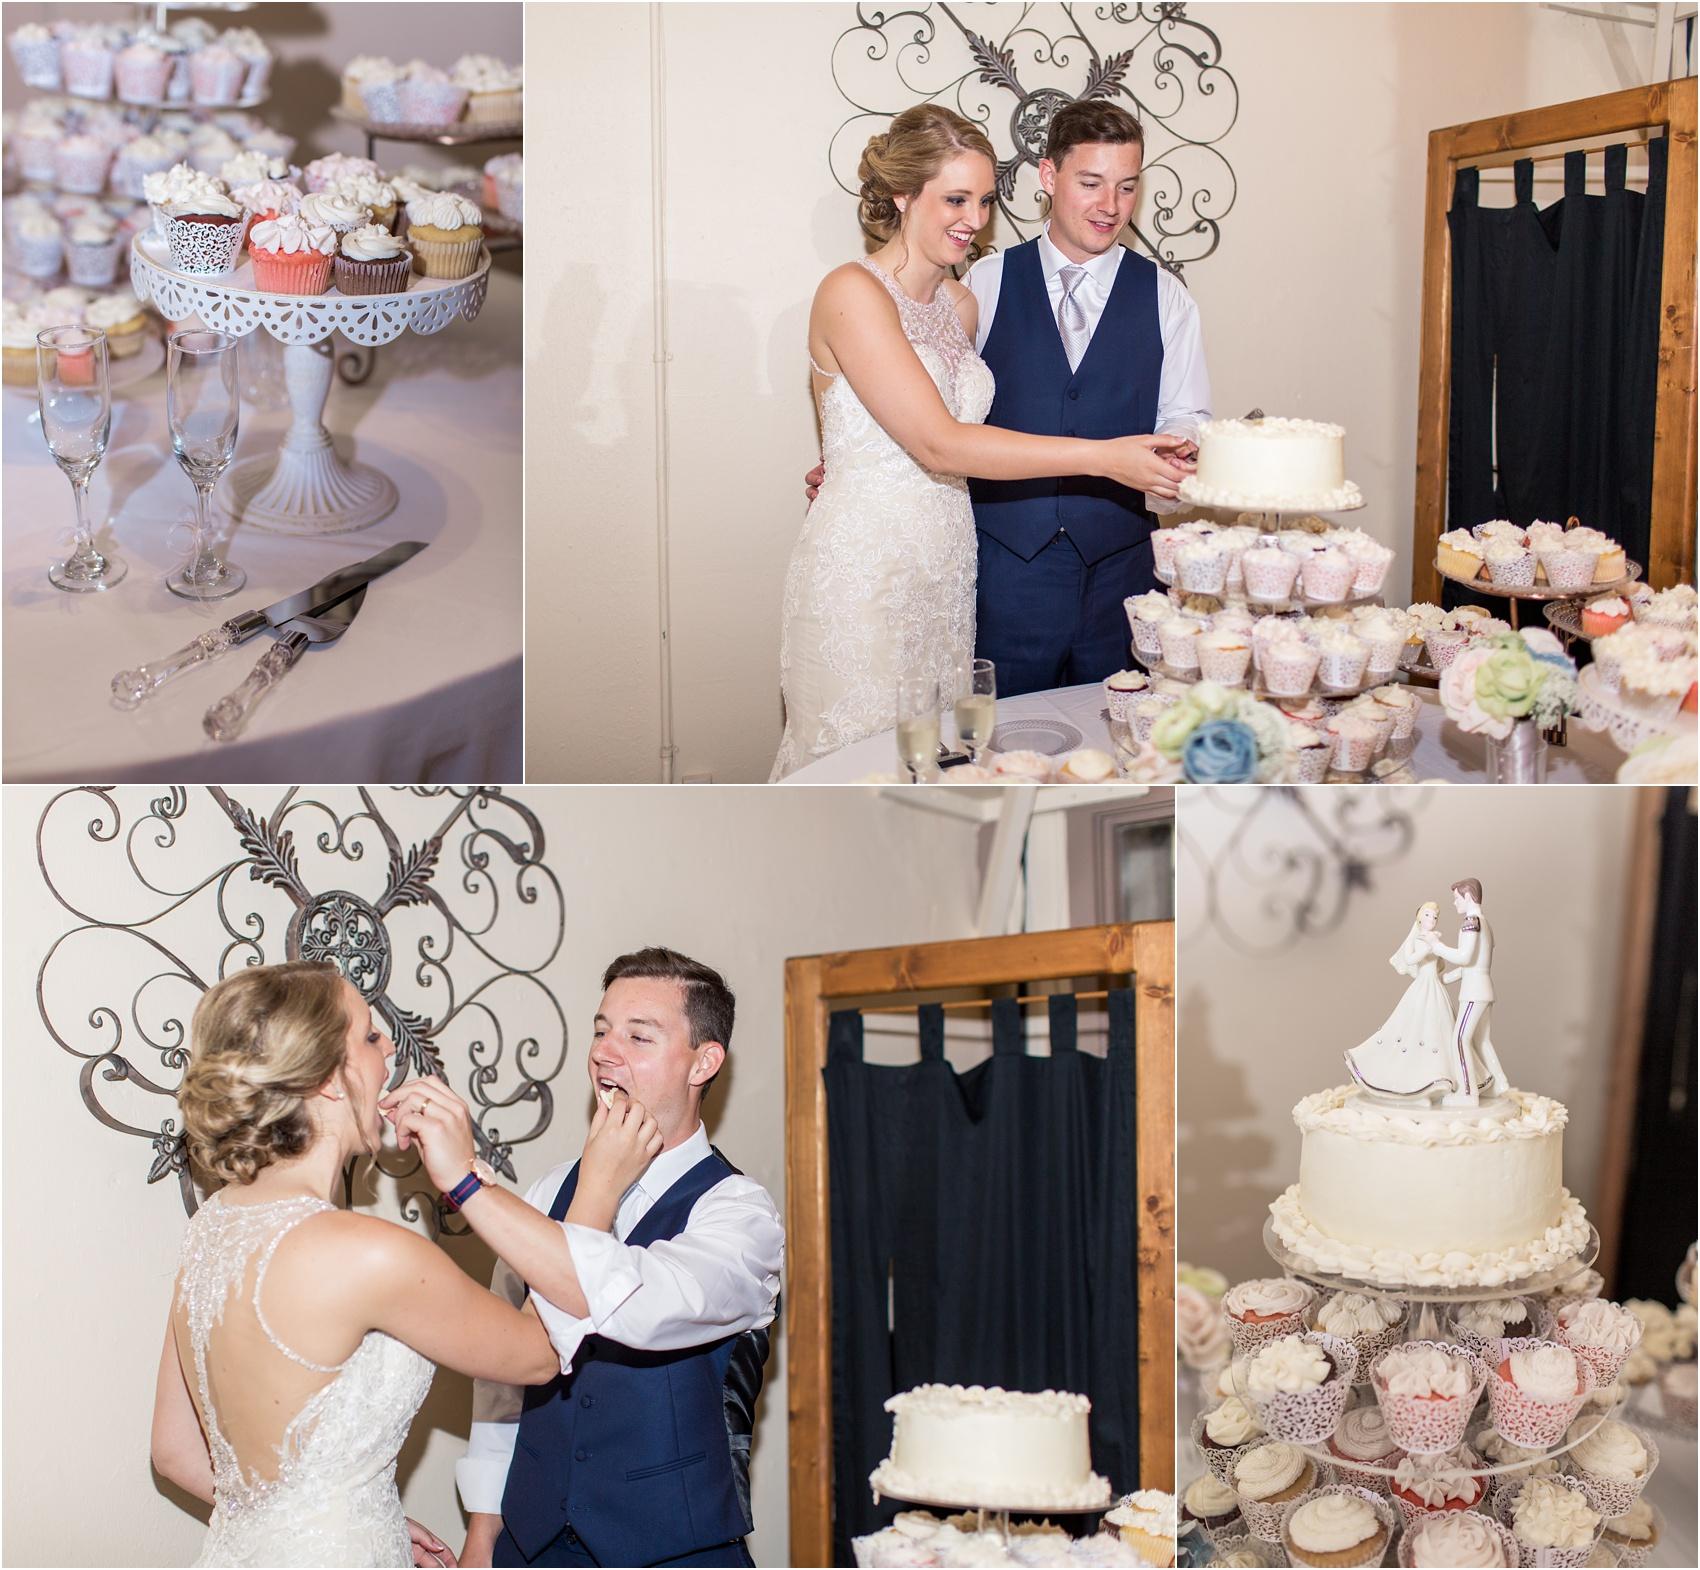 Savannah Eve Photography- Roper-Powell Wedding- Blog-49.jpg